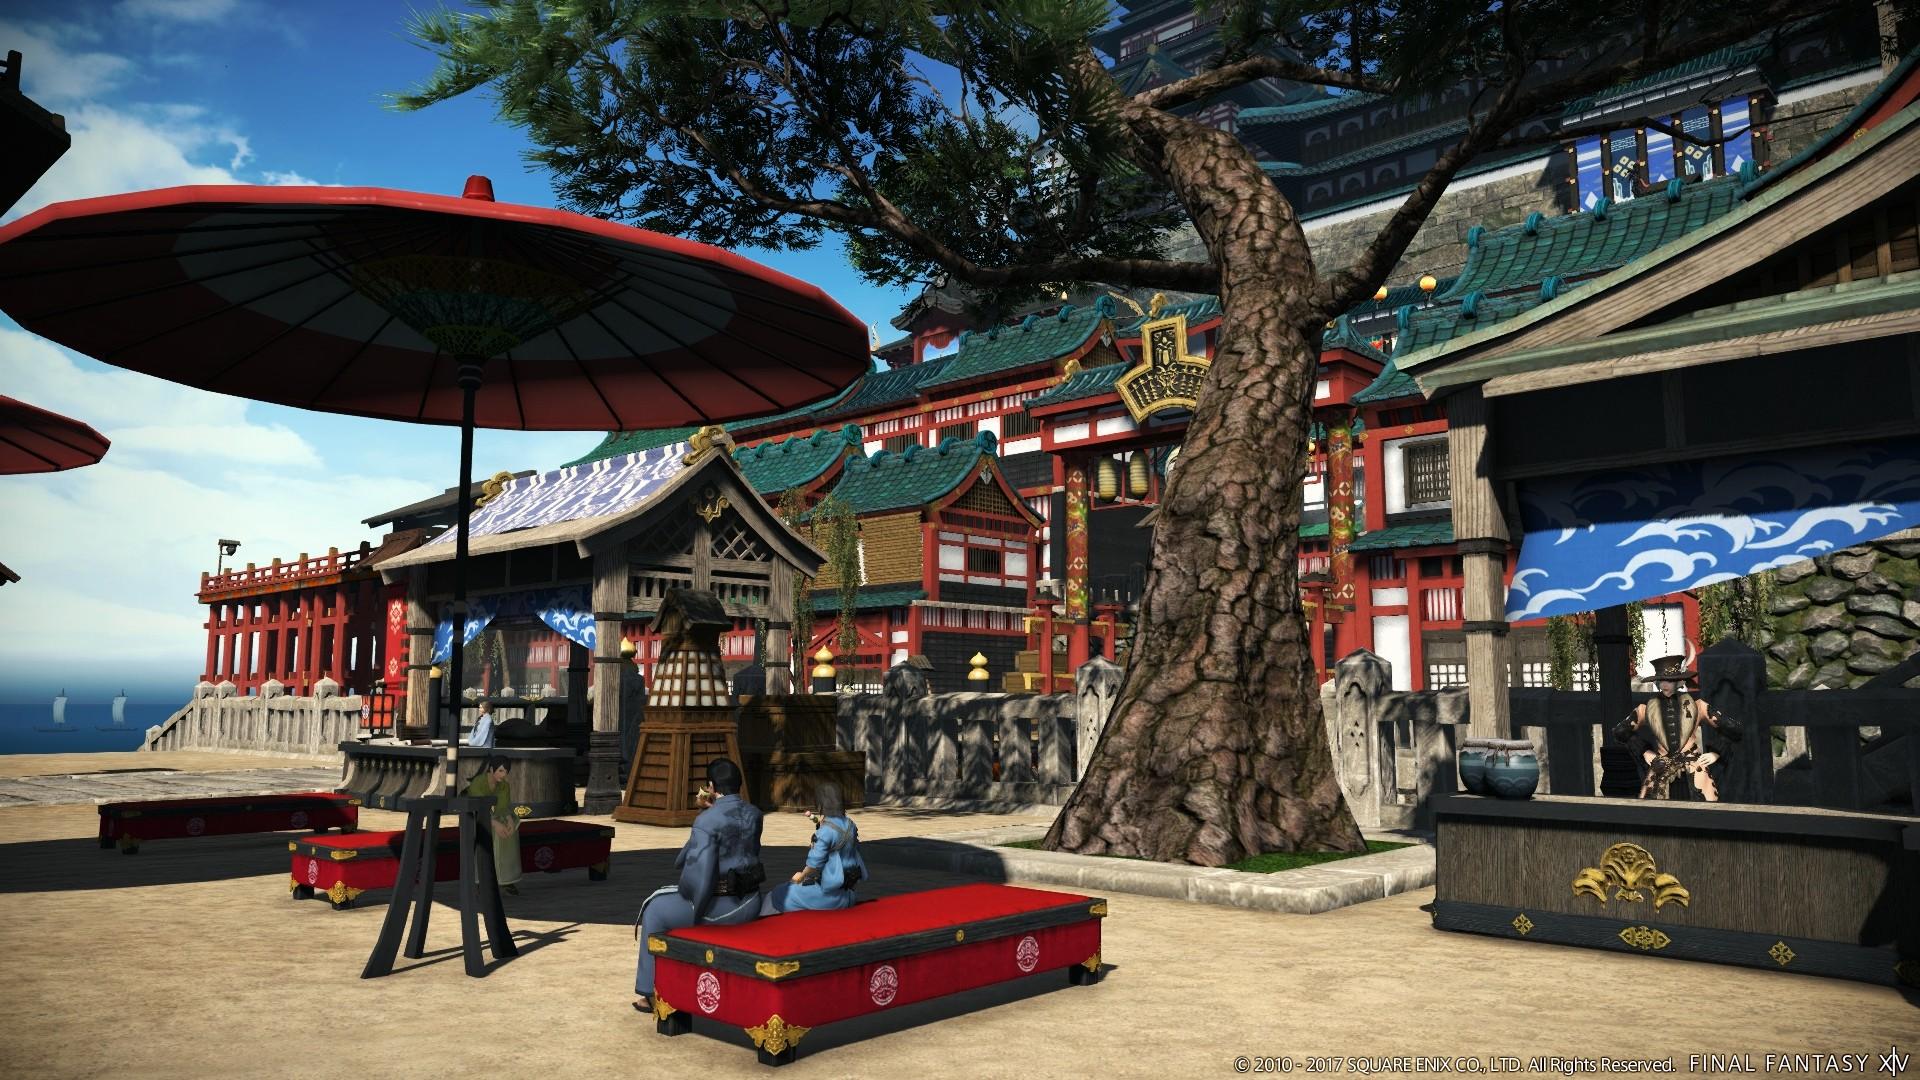 Final Fantasy XIV Stormblood: Trailer zeigt blühende Landschaften